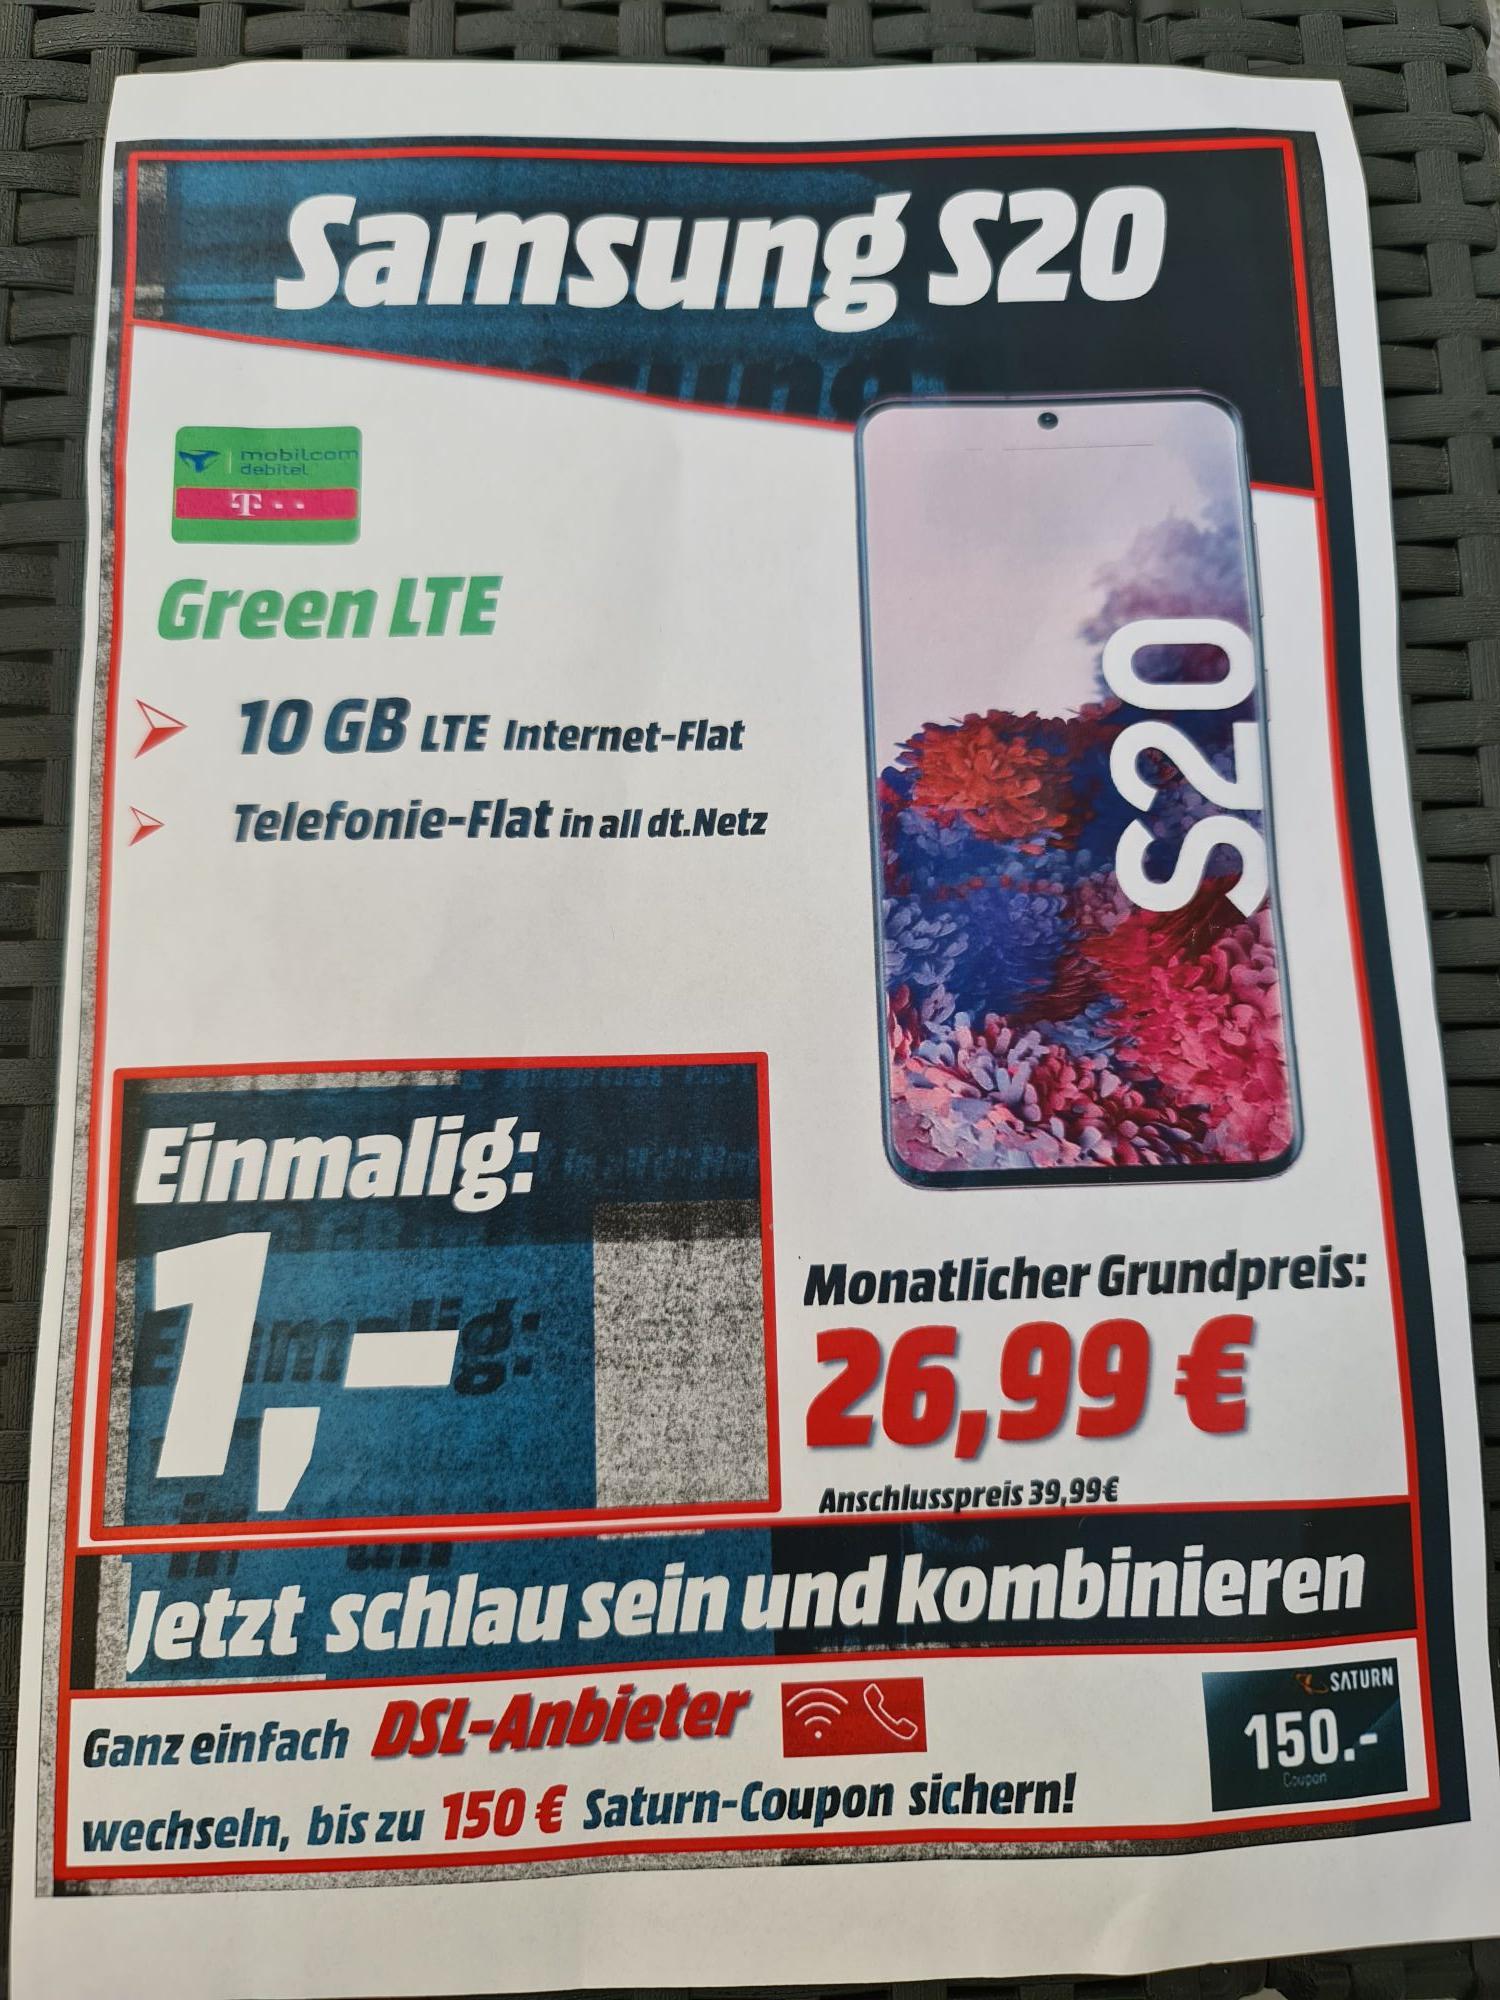 (Lokal Saturn Leverkusen) Mobilcom Debitel S20 26,99 im Monat Allnet 10GB Telekom